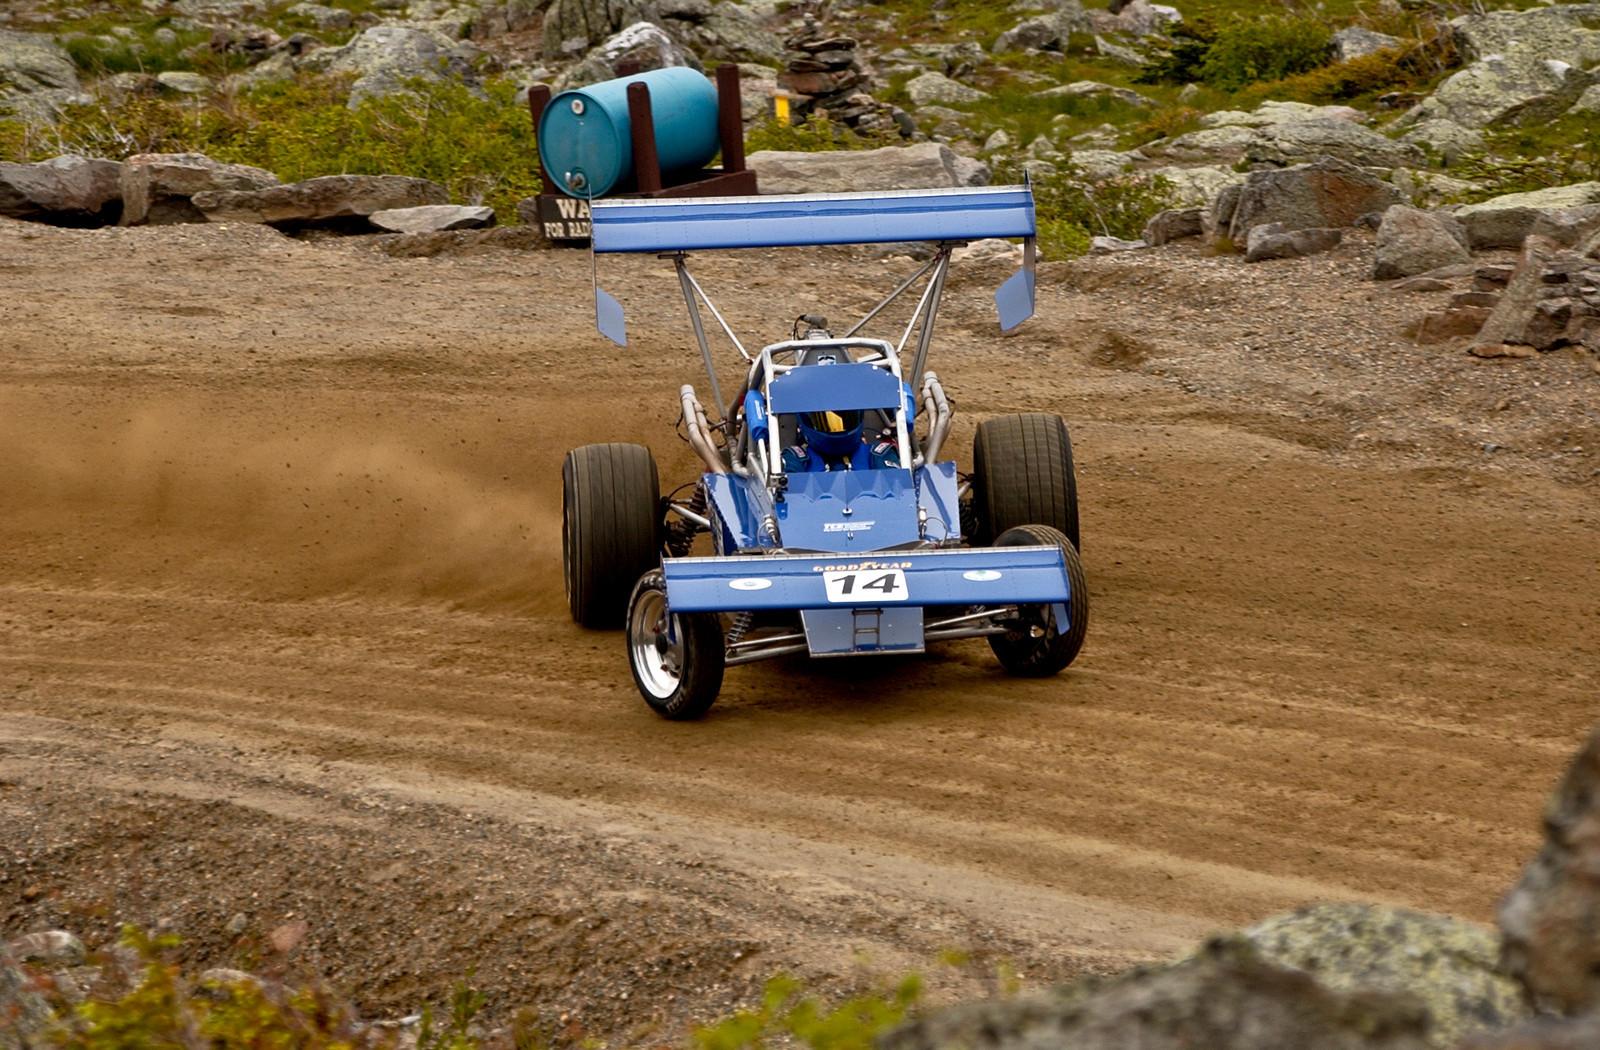 Wells Coyote Race Car